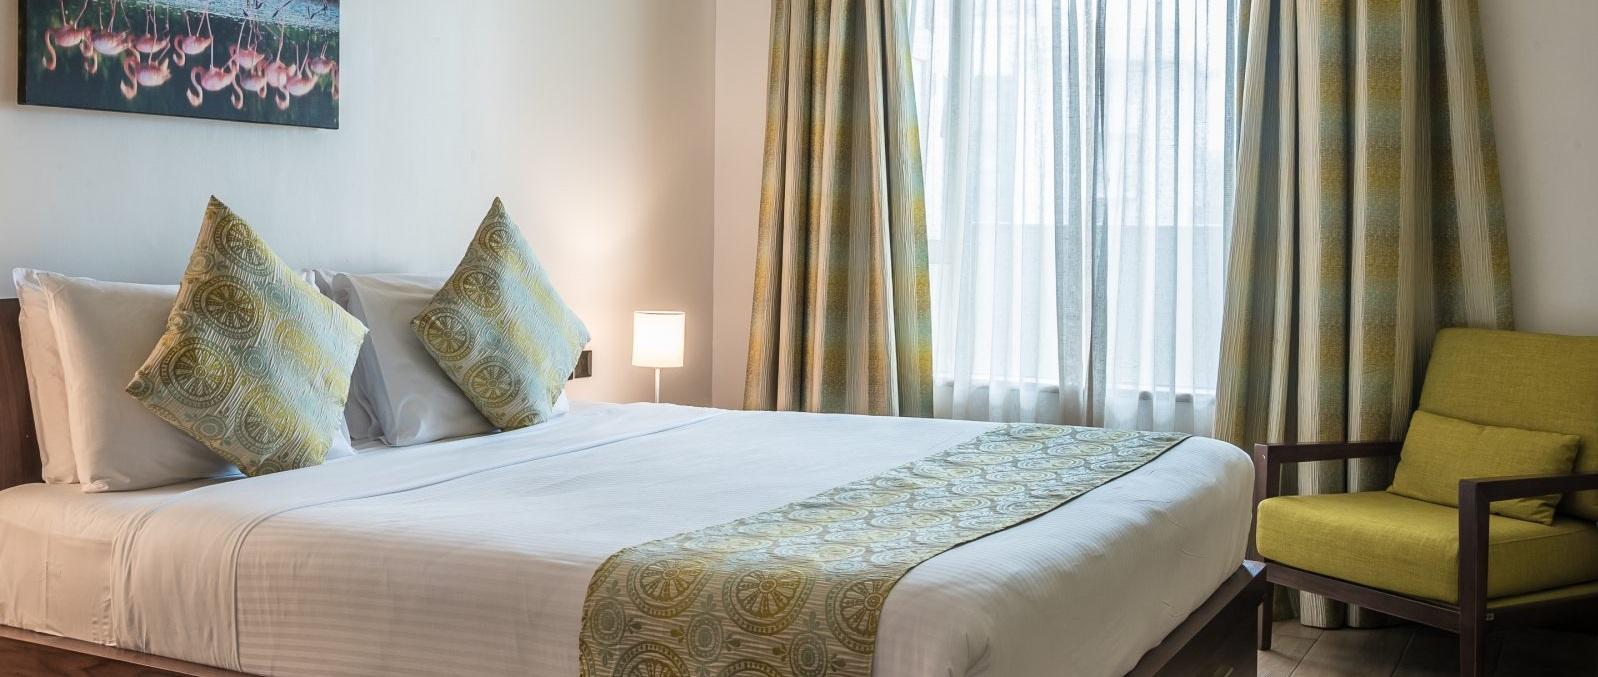 1 Bedroom Apartments in Nairobi